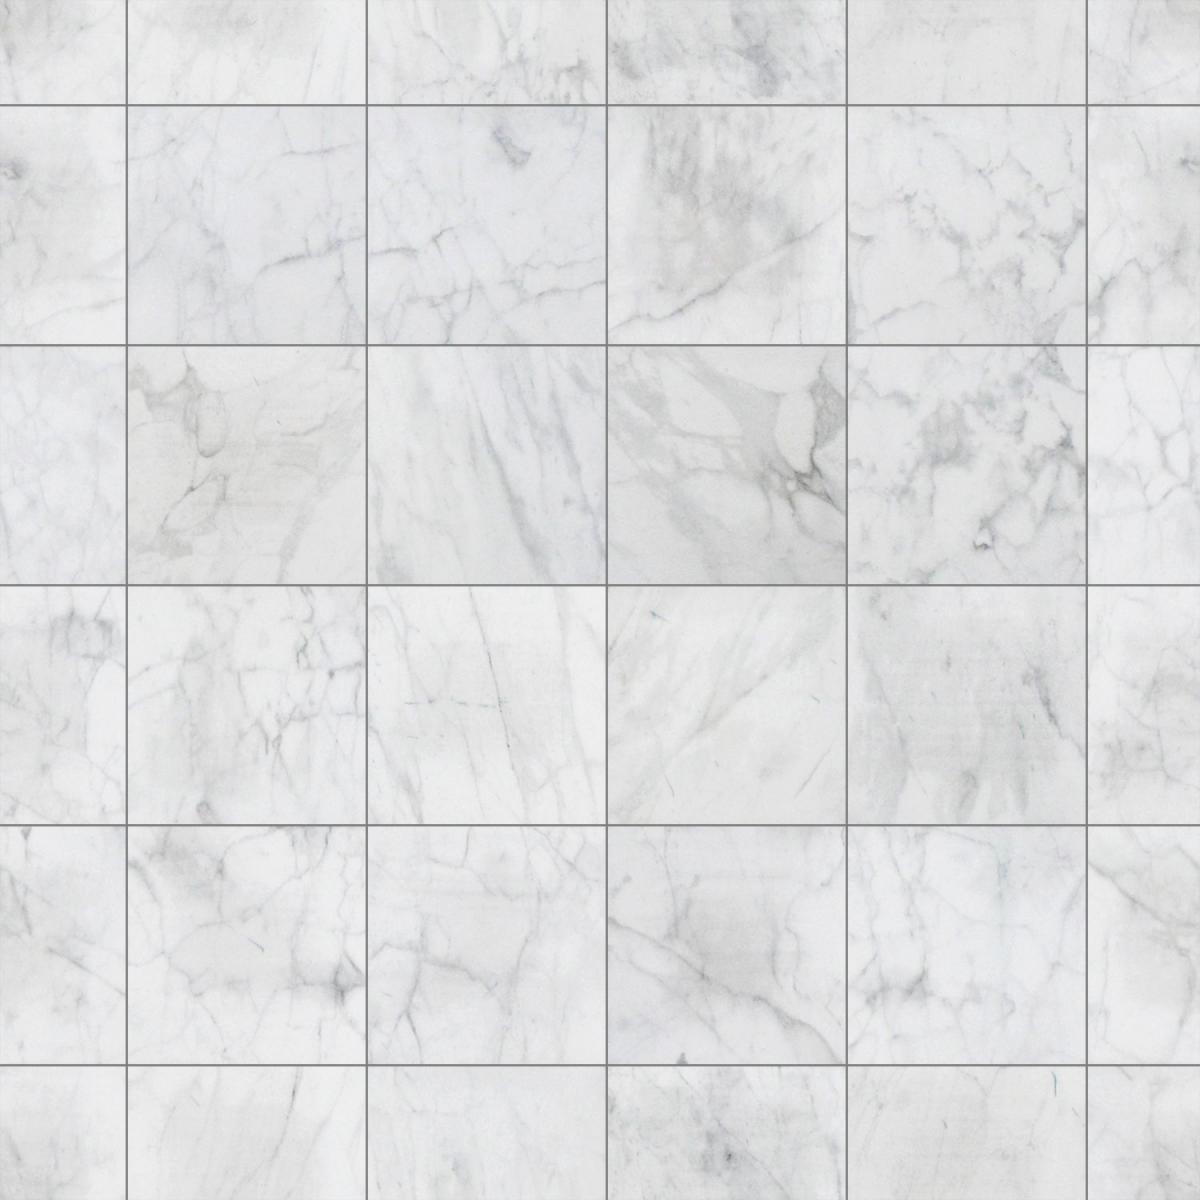 Carrelage Moderne Texture Frais Photos Vives Carrelage Best White Marble Texture Background White